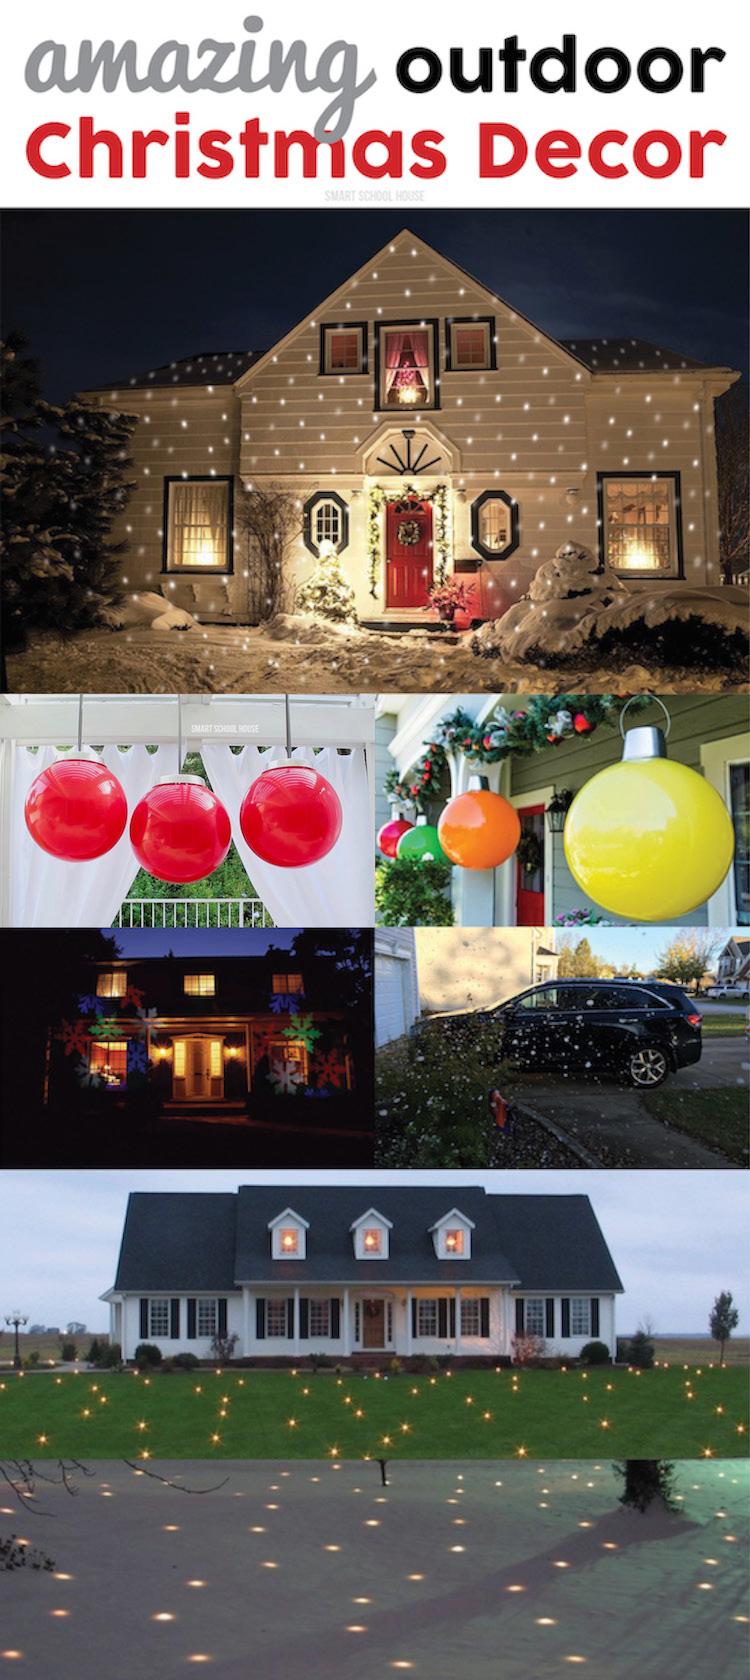 Outdoor Christmas Decor.Outdoor Christmas Decor Diy Decoration Ideas For Christmas